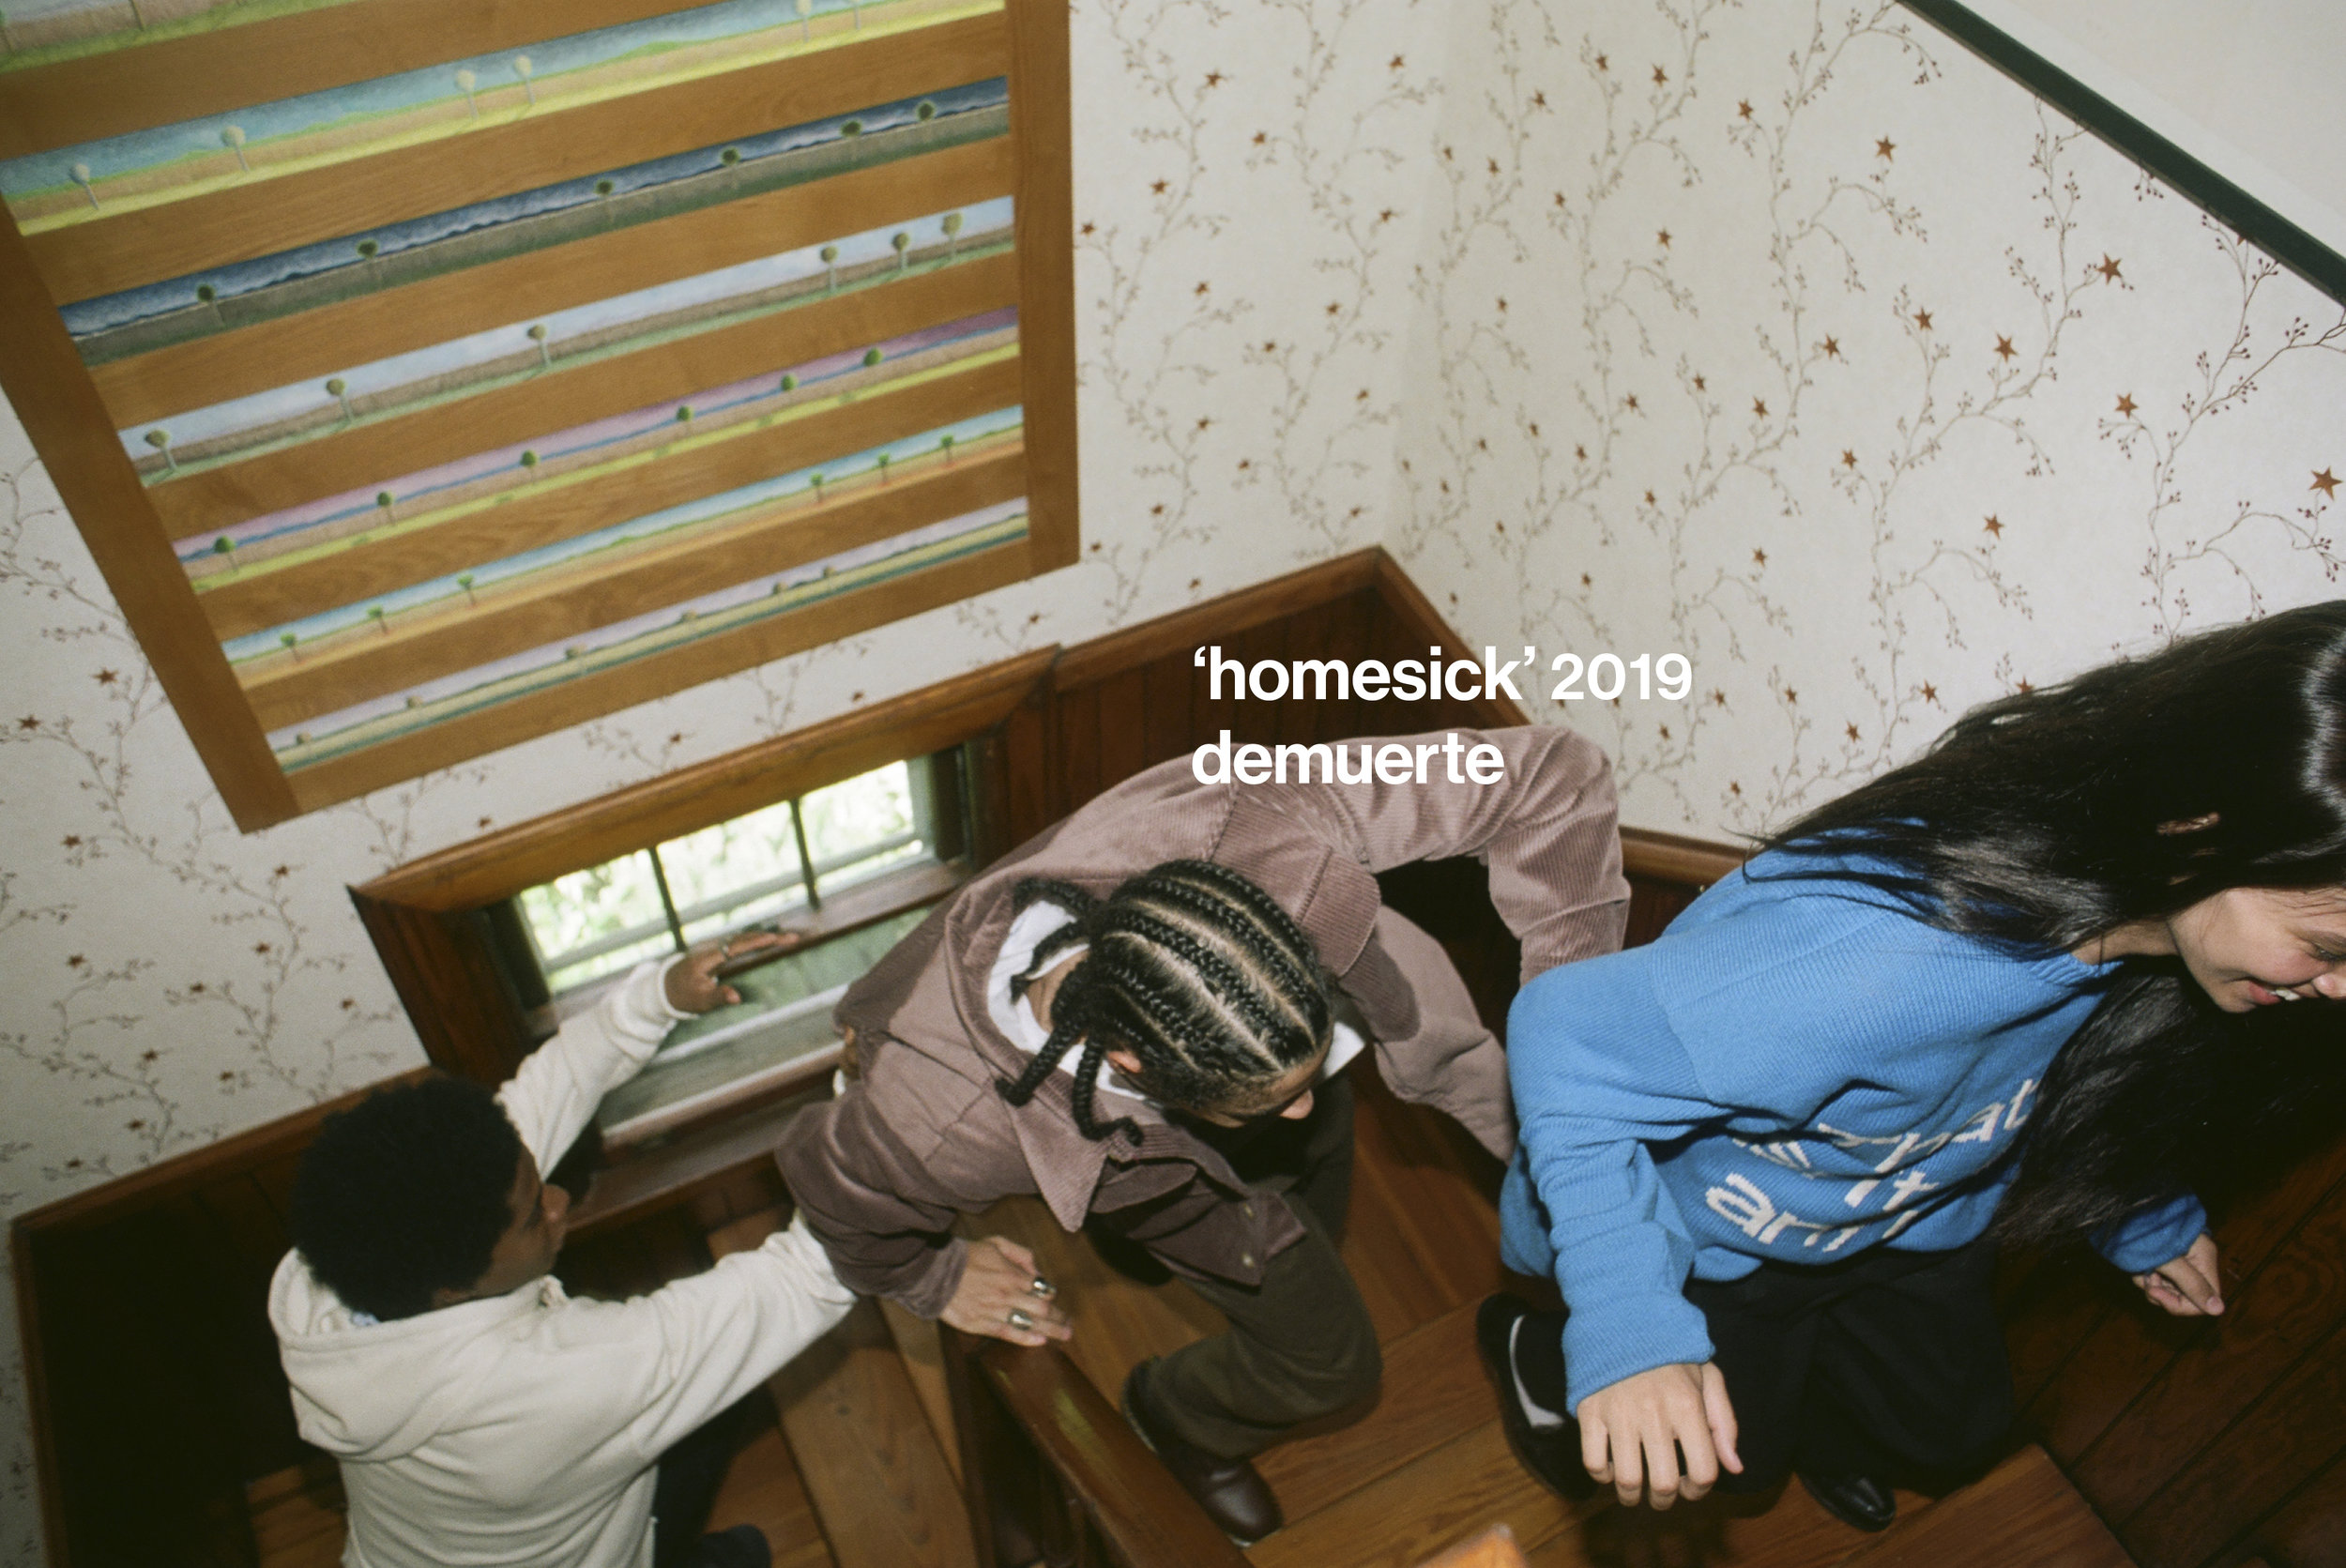 homesick campaign 5A.jpg